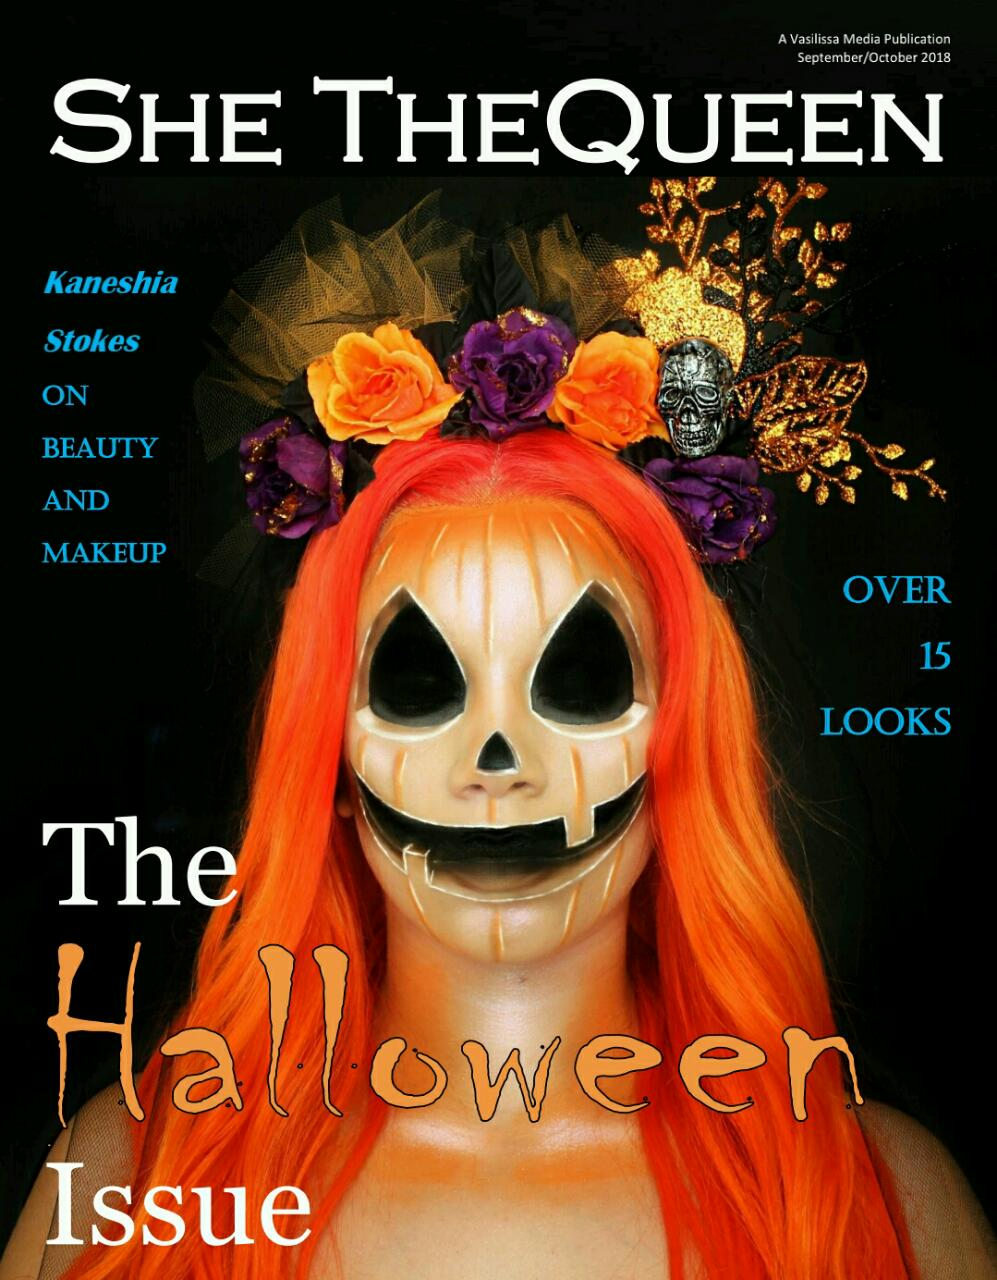 she thequeen, she thequeen magazine, blogger magazine, lifestyle magazine, halloween magazine, halloween, christmas issue, september october issue, magazines, kaneshia stokes, kaneshia sana